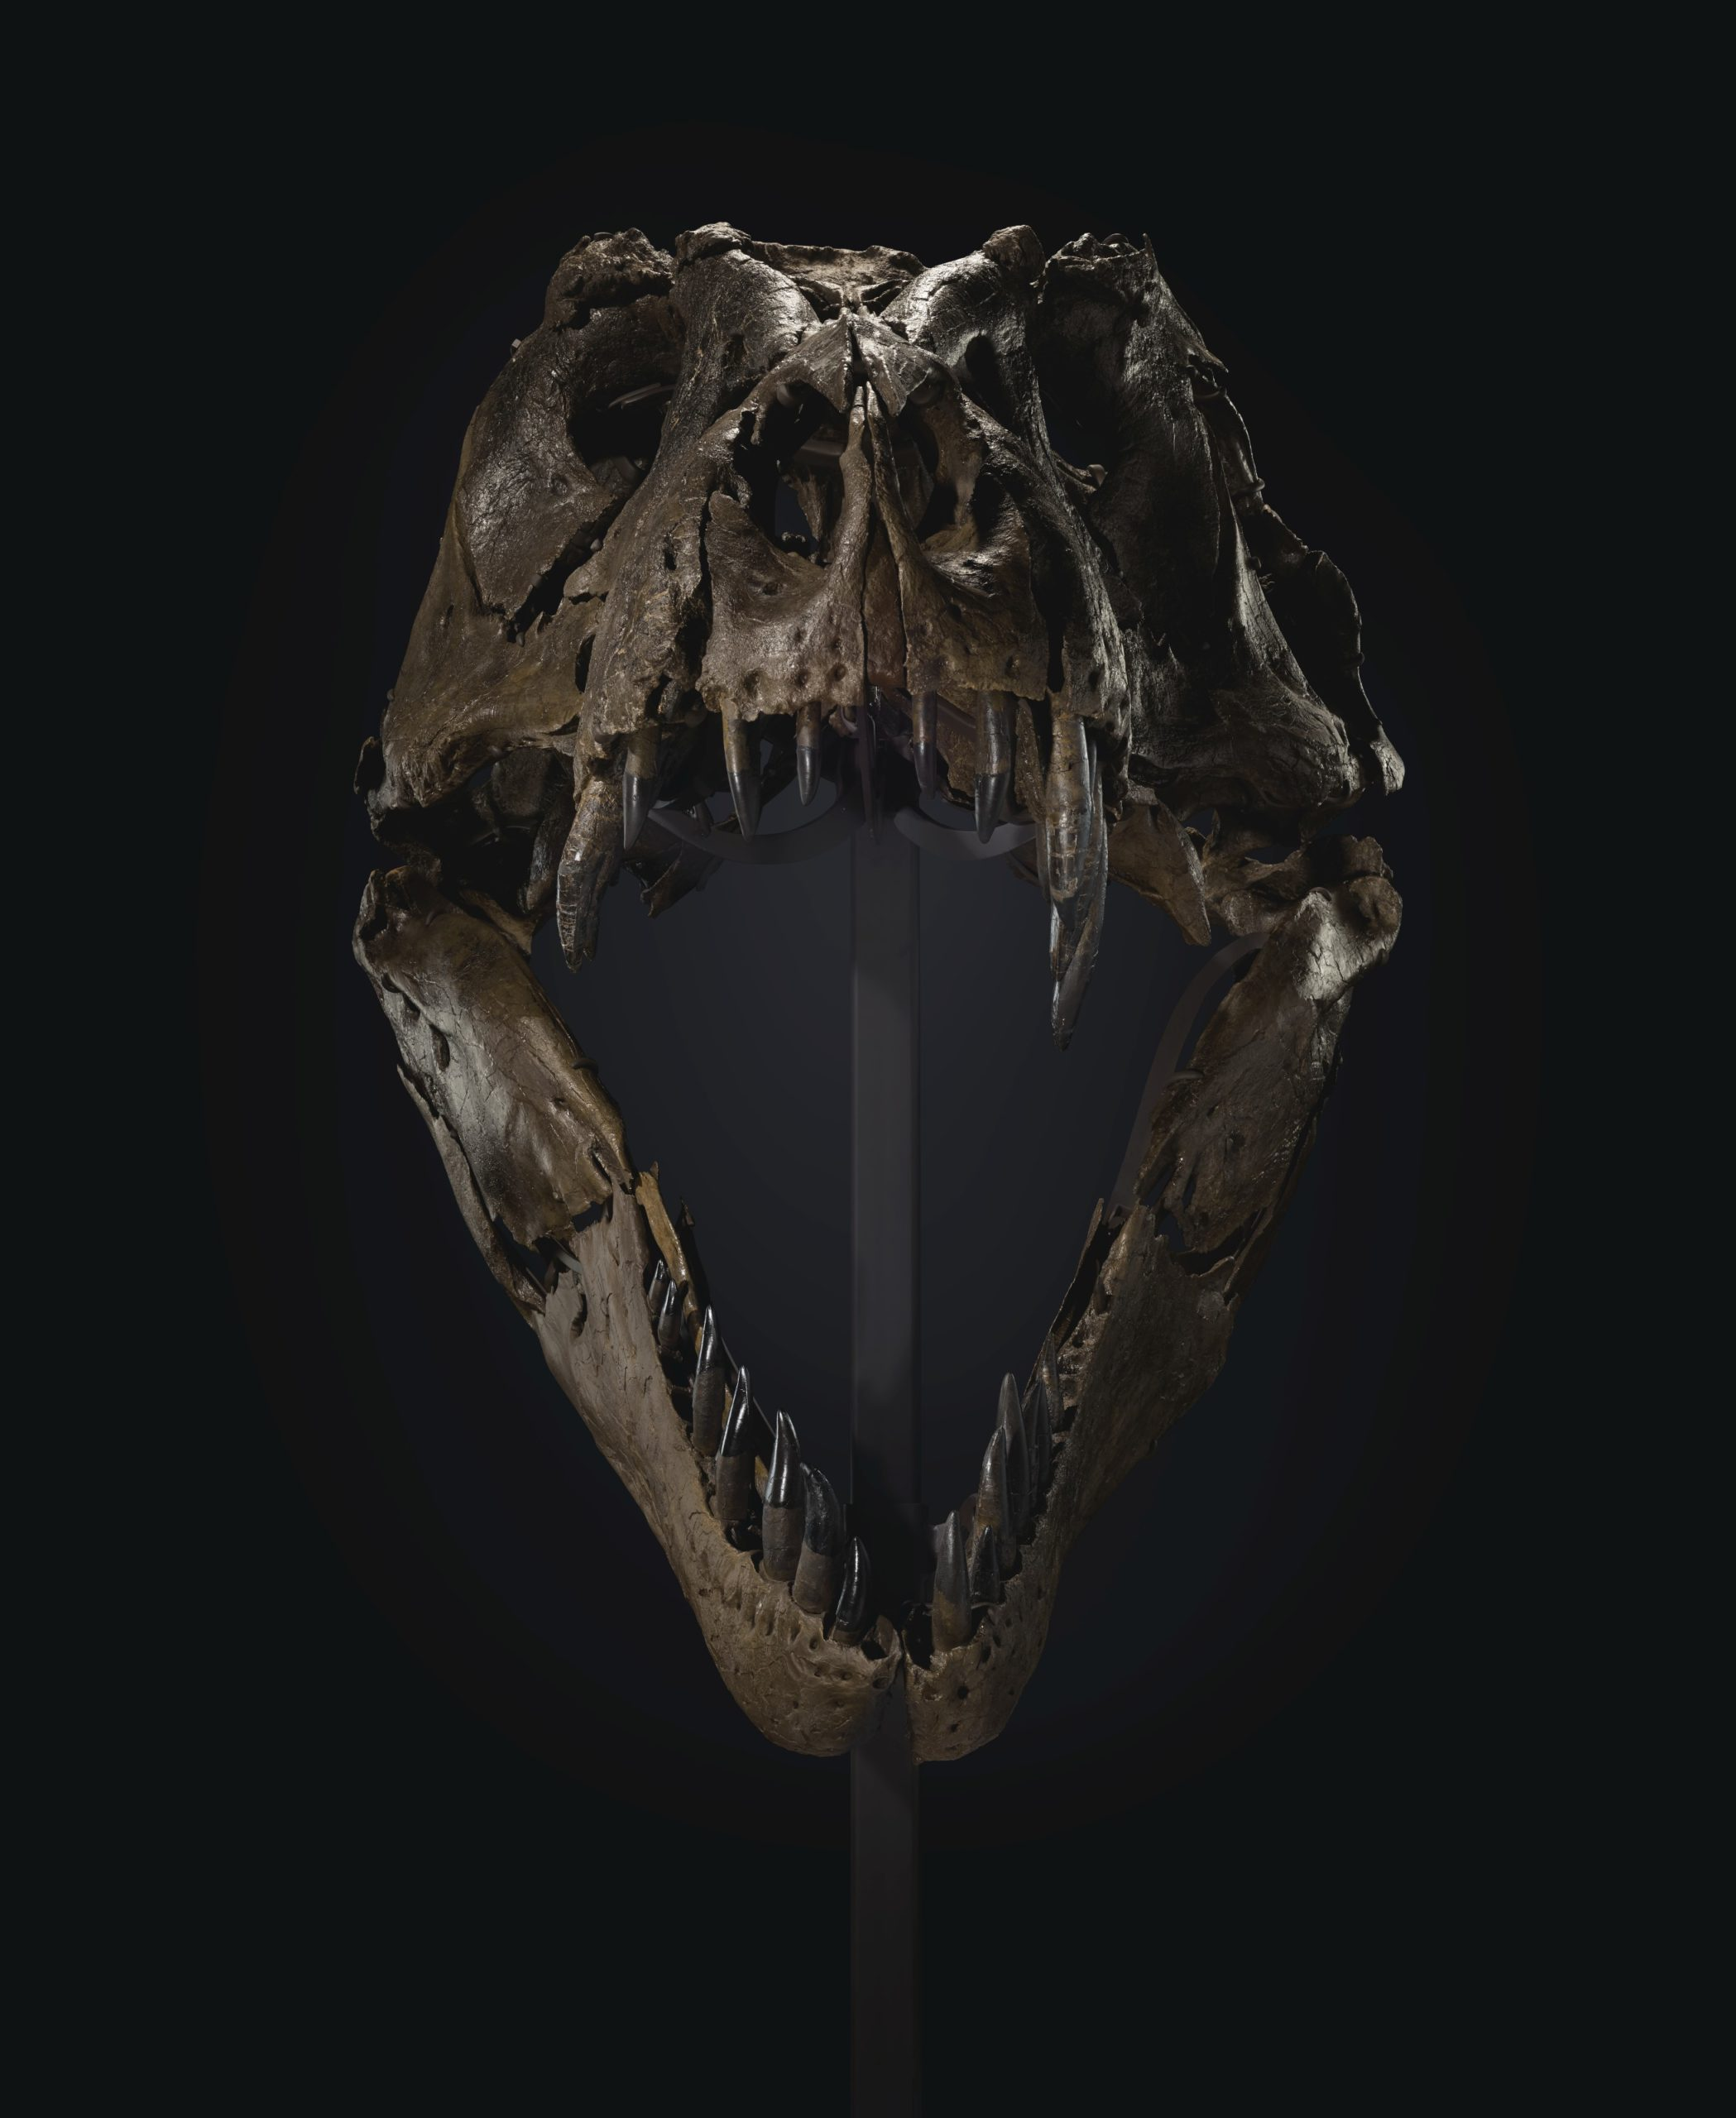 T-Rex STAN - TYRANNOSAURUS REX   SOUTH DAKOTA, USA Estimate USD 6,000,000 - USD 8,000,000 © Christie's